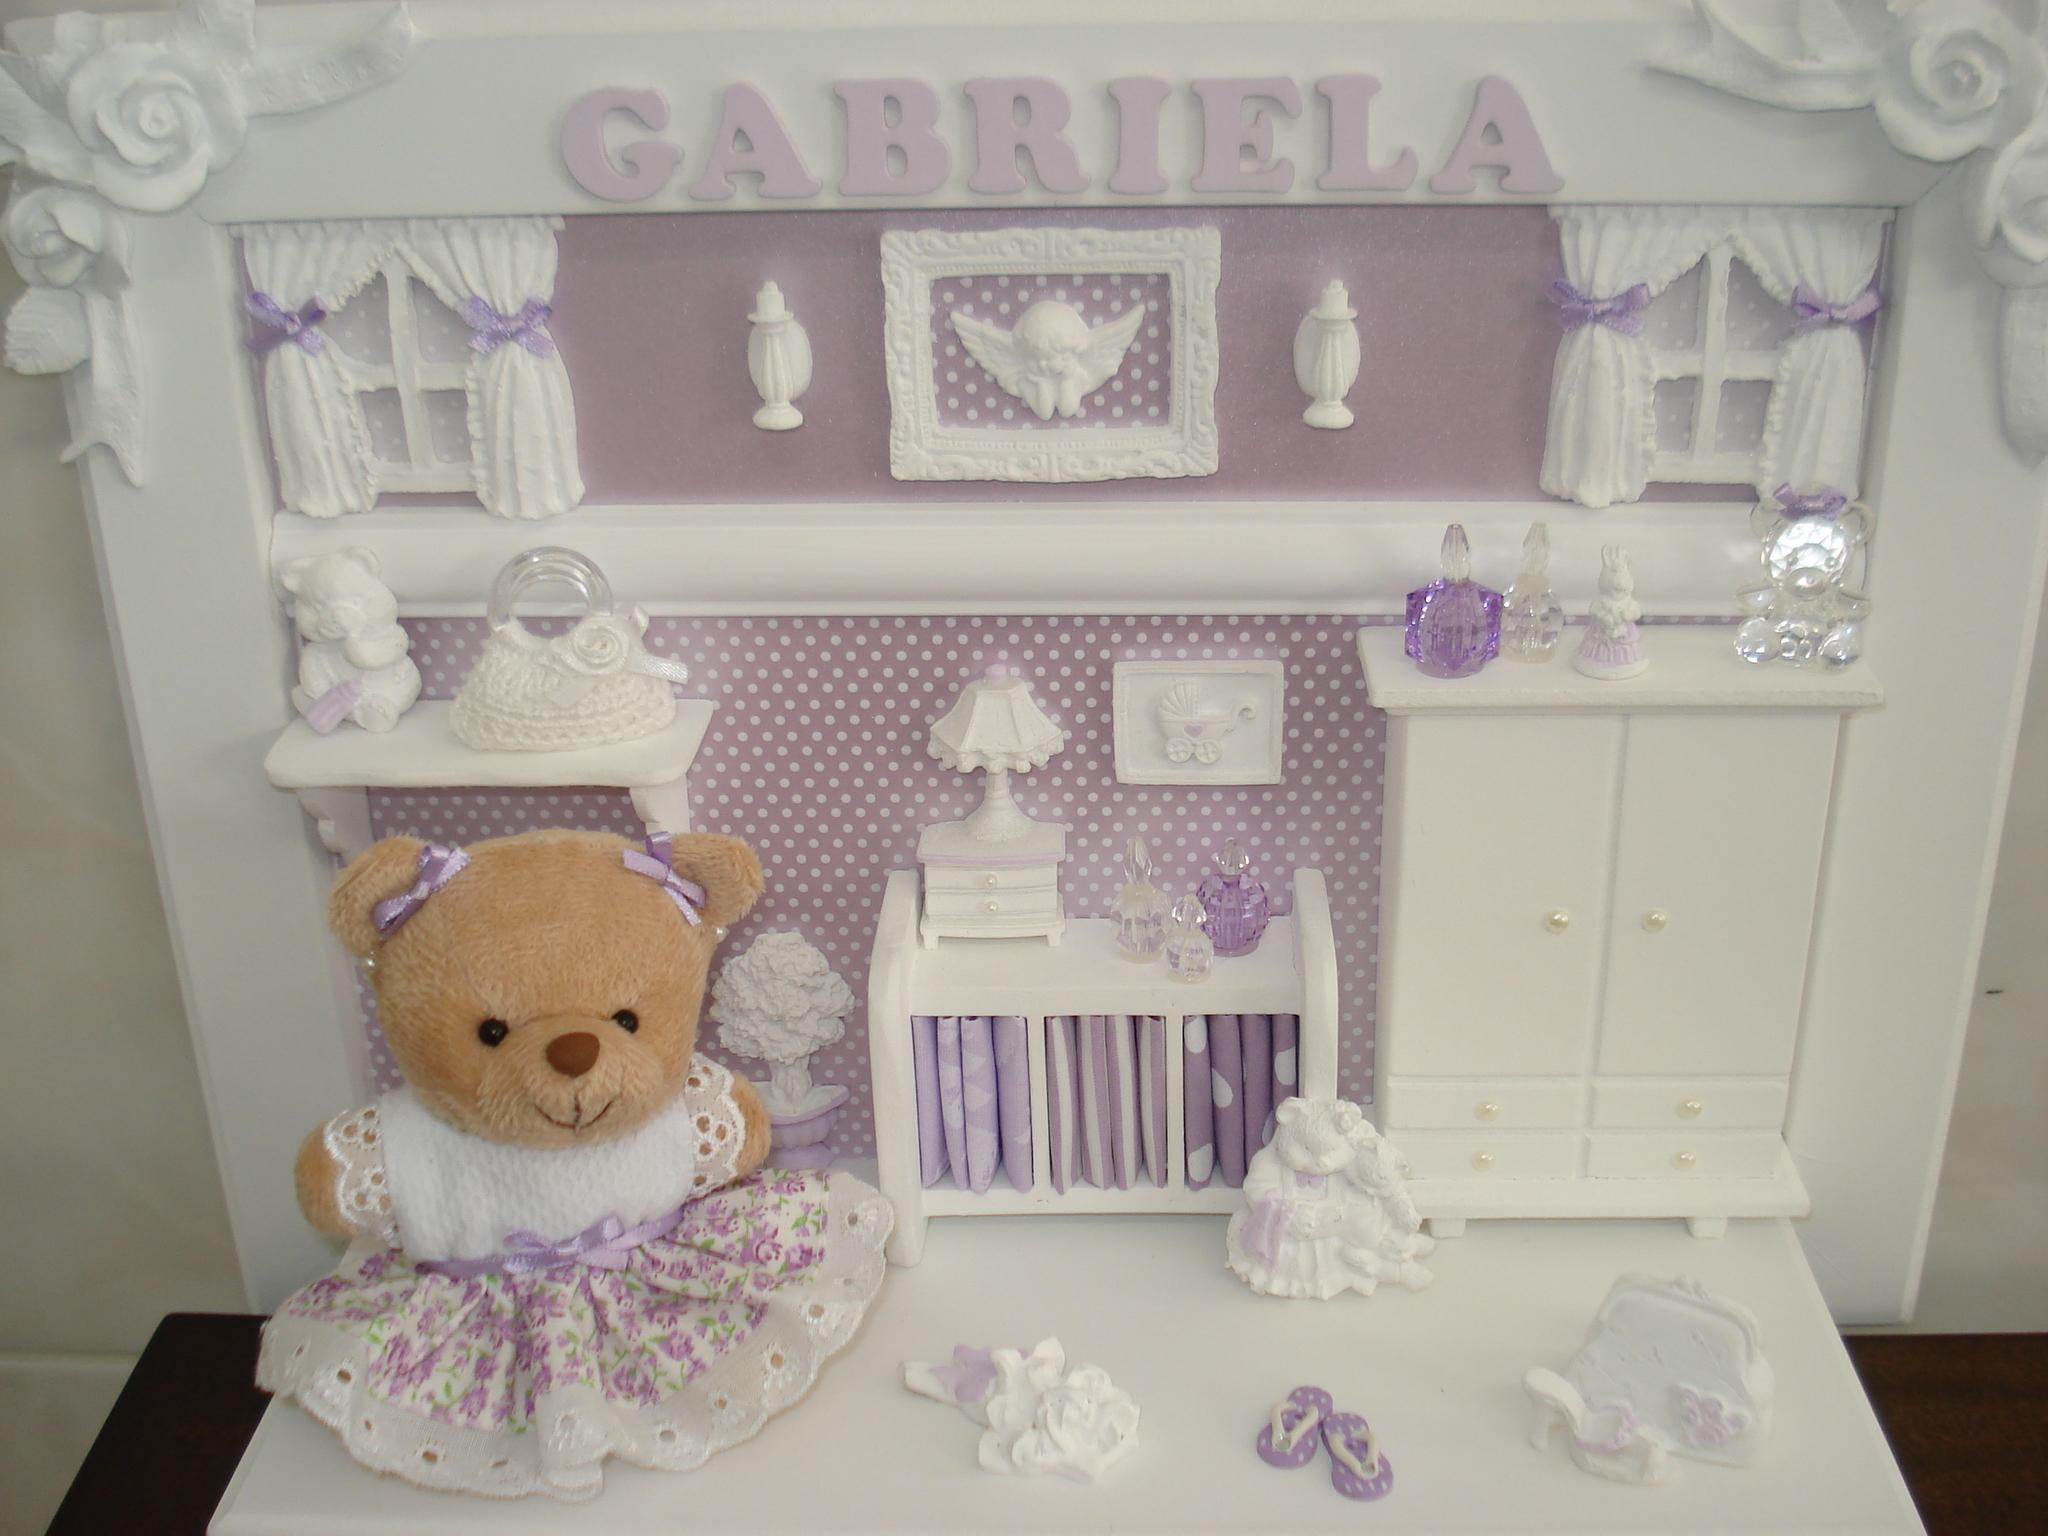 decoracao alternativa de quarto infantil: maternidade decoracao de quarto infantil decoracao de quarto infantil